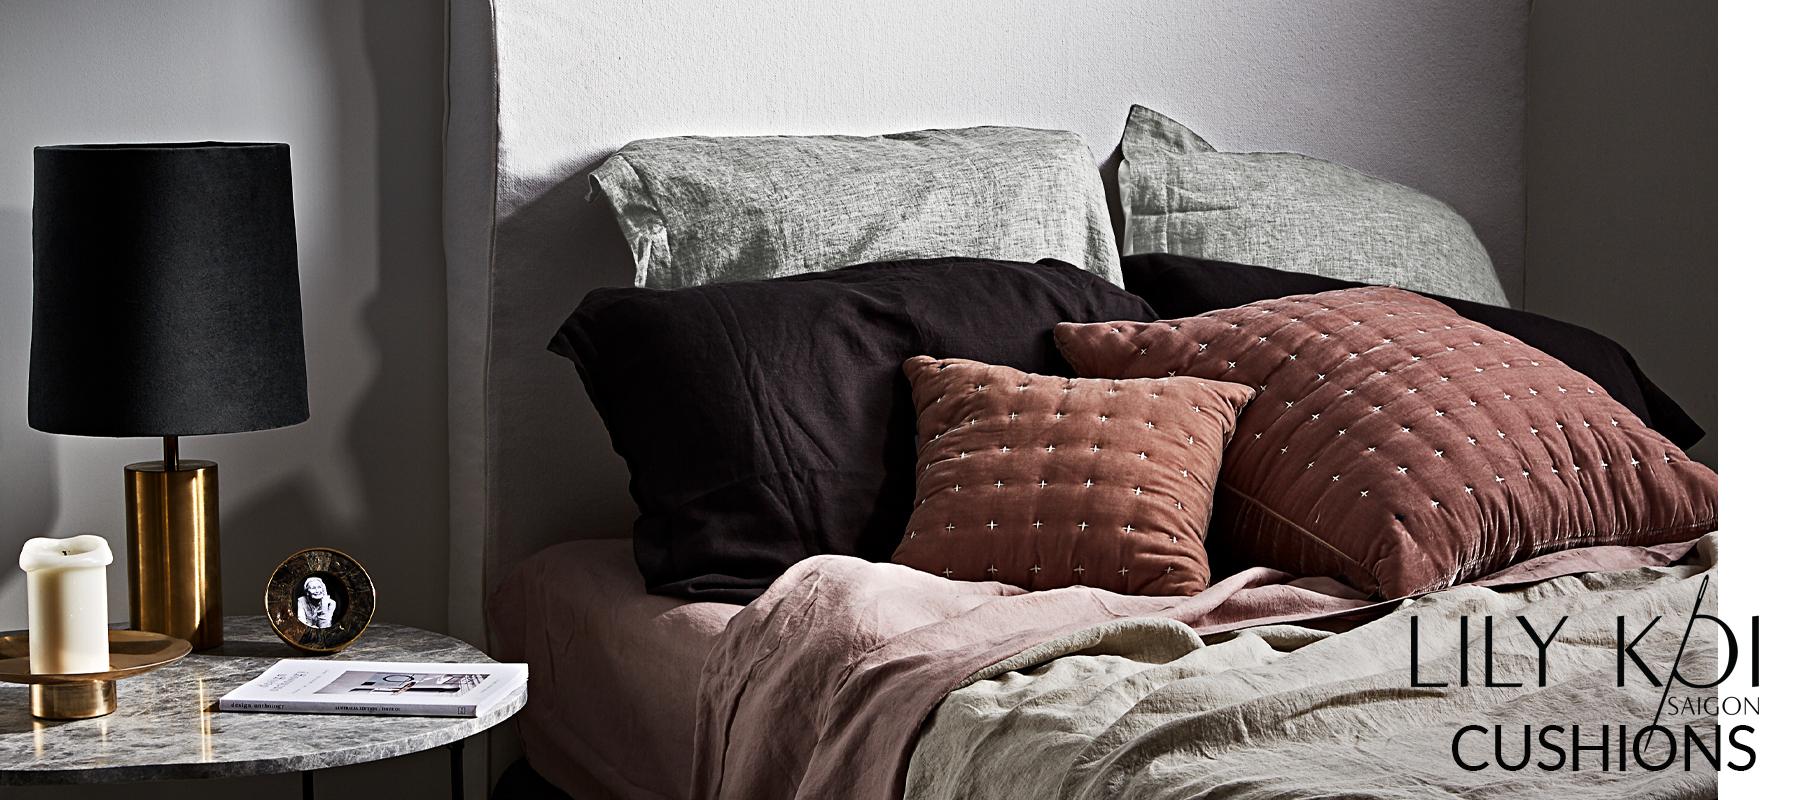 Horgans Lily Koi Cushions